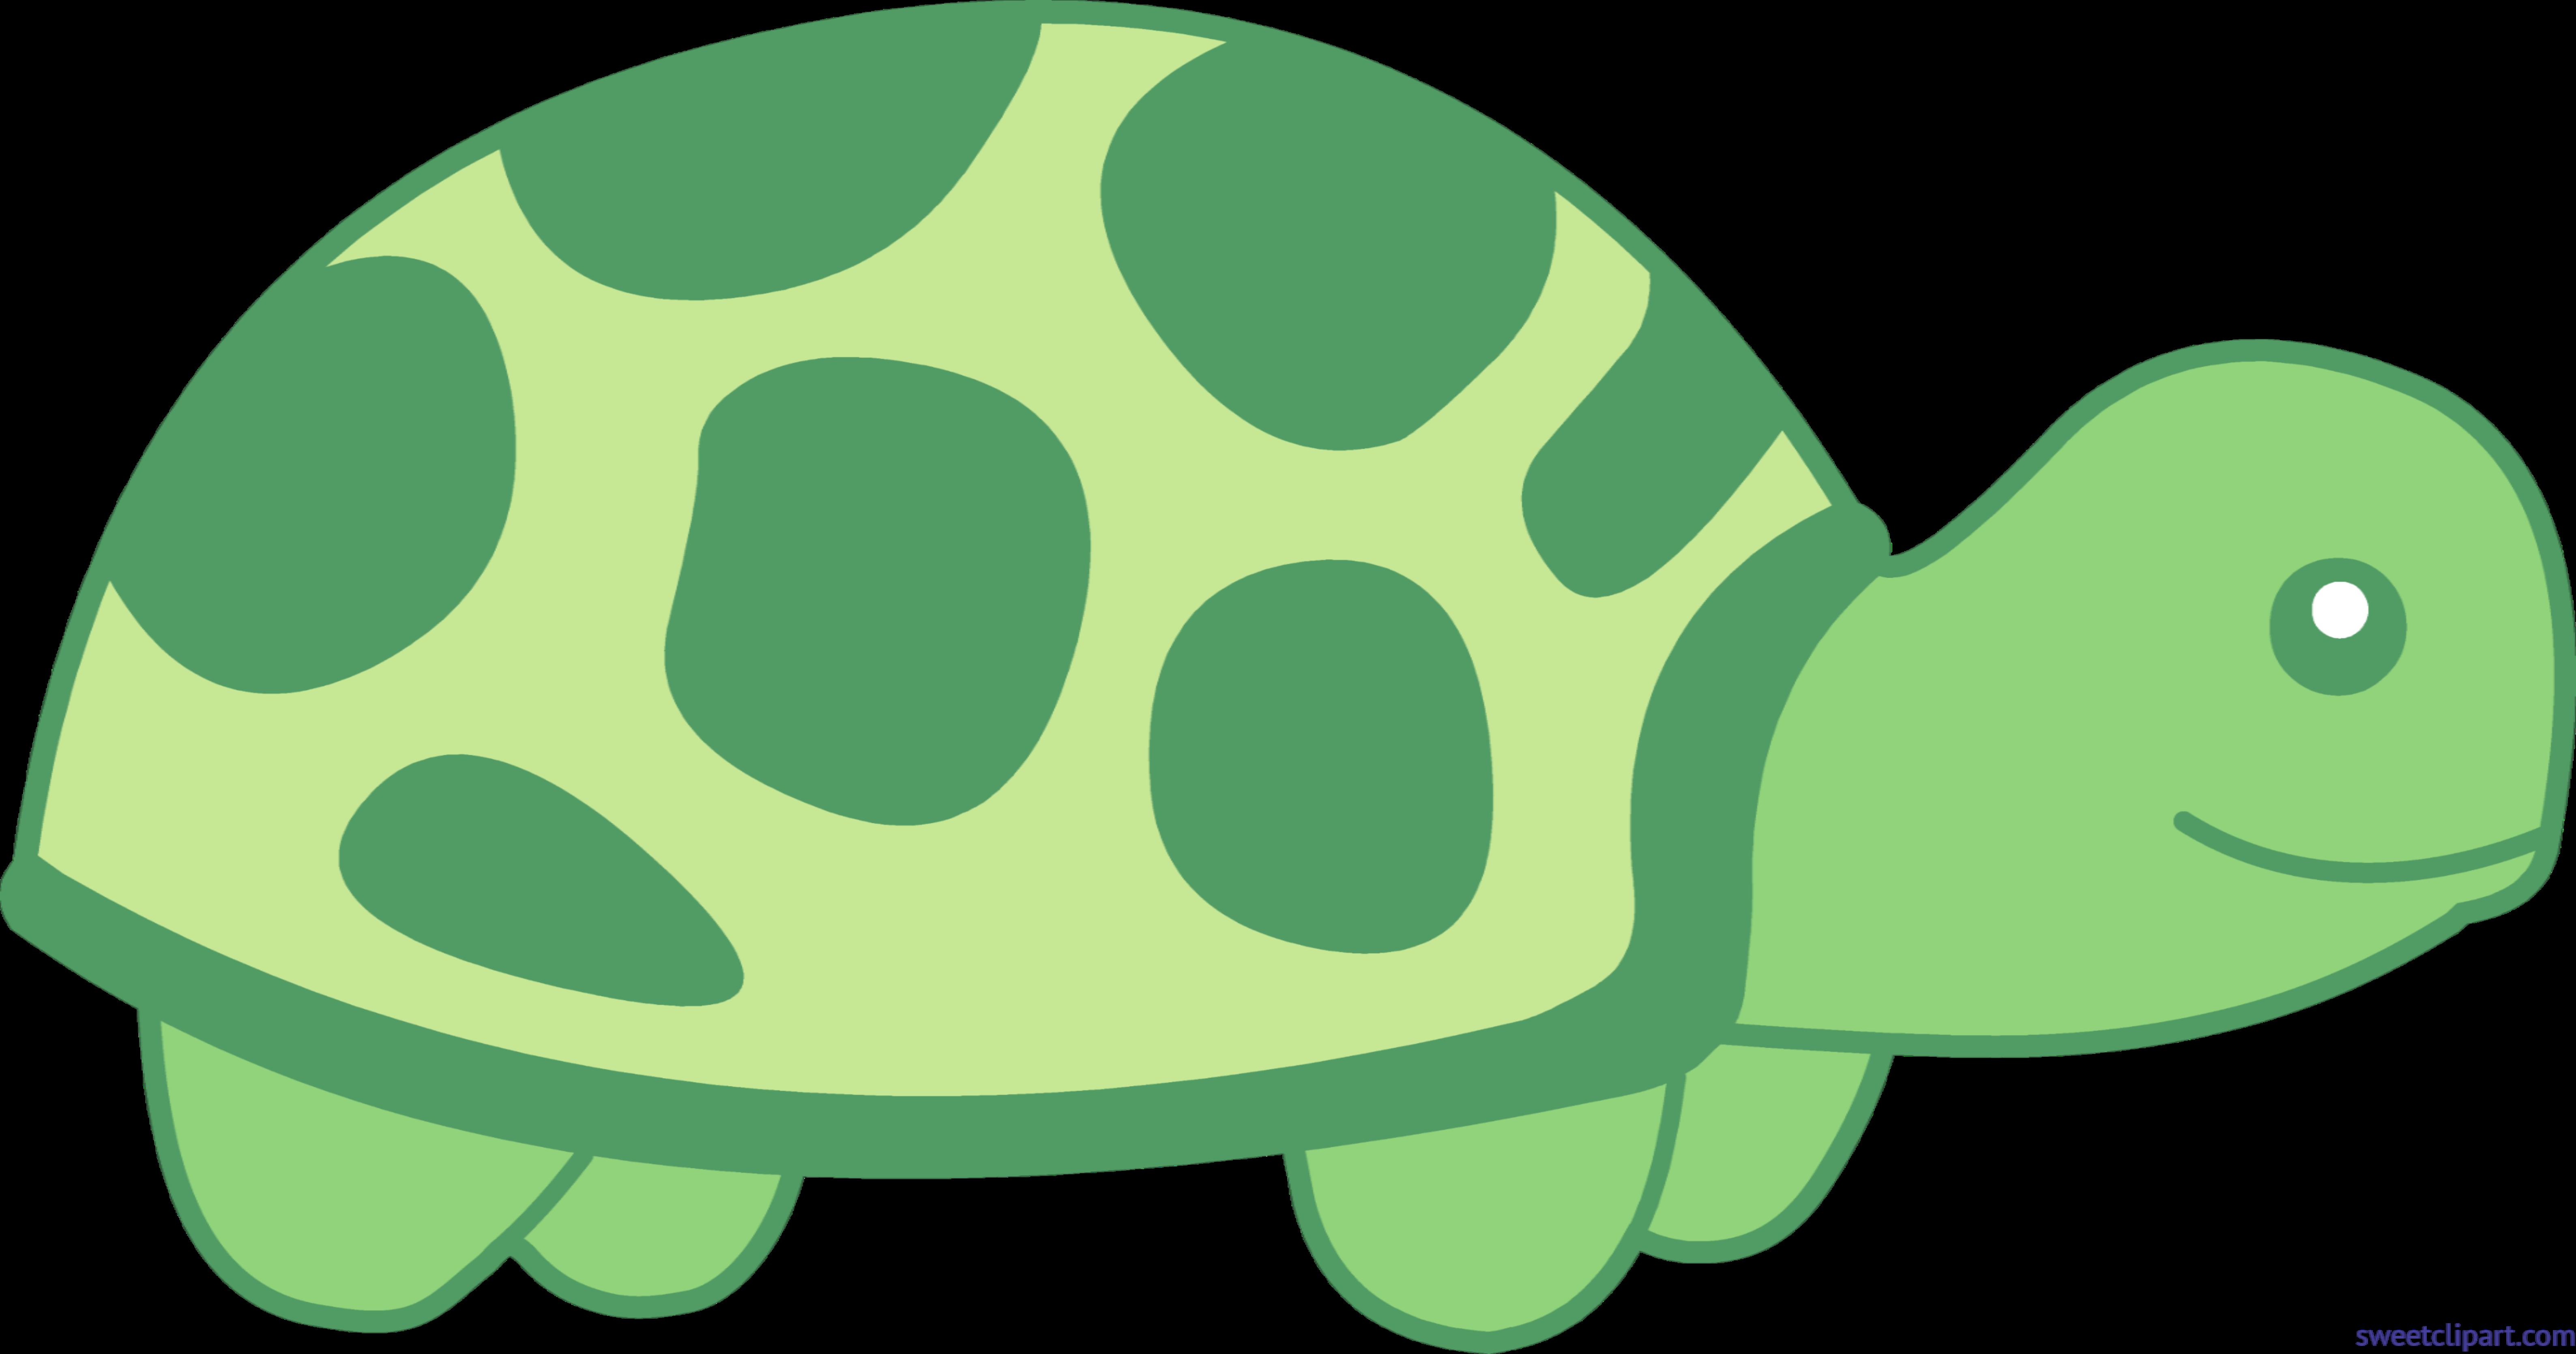 Sea at getdrawings com. Clipart turtle cute